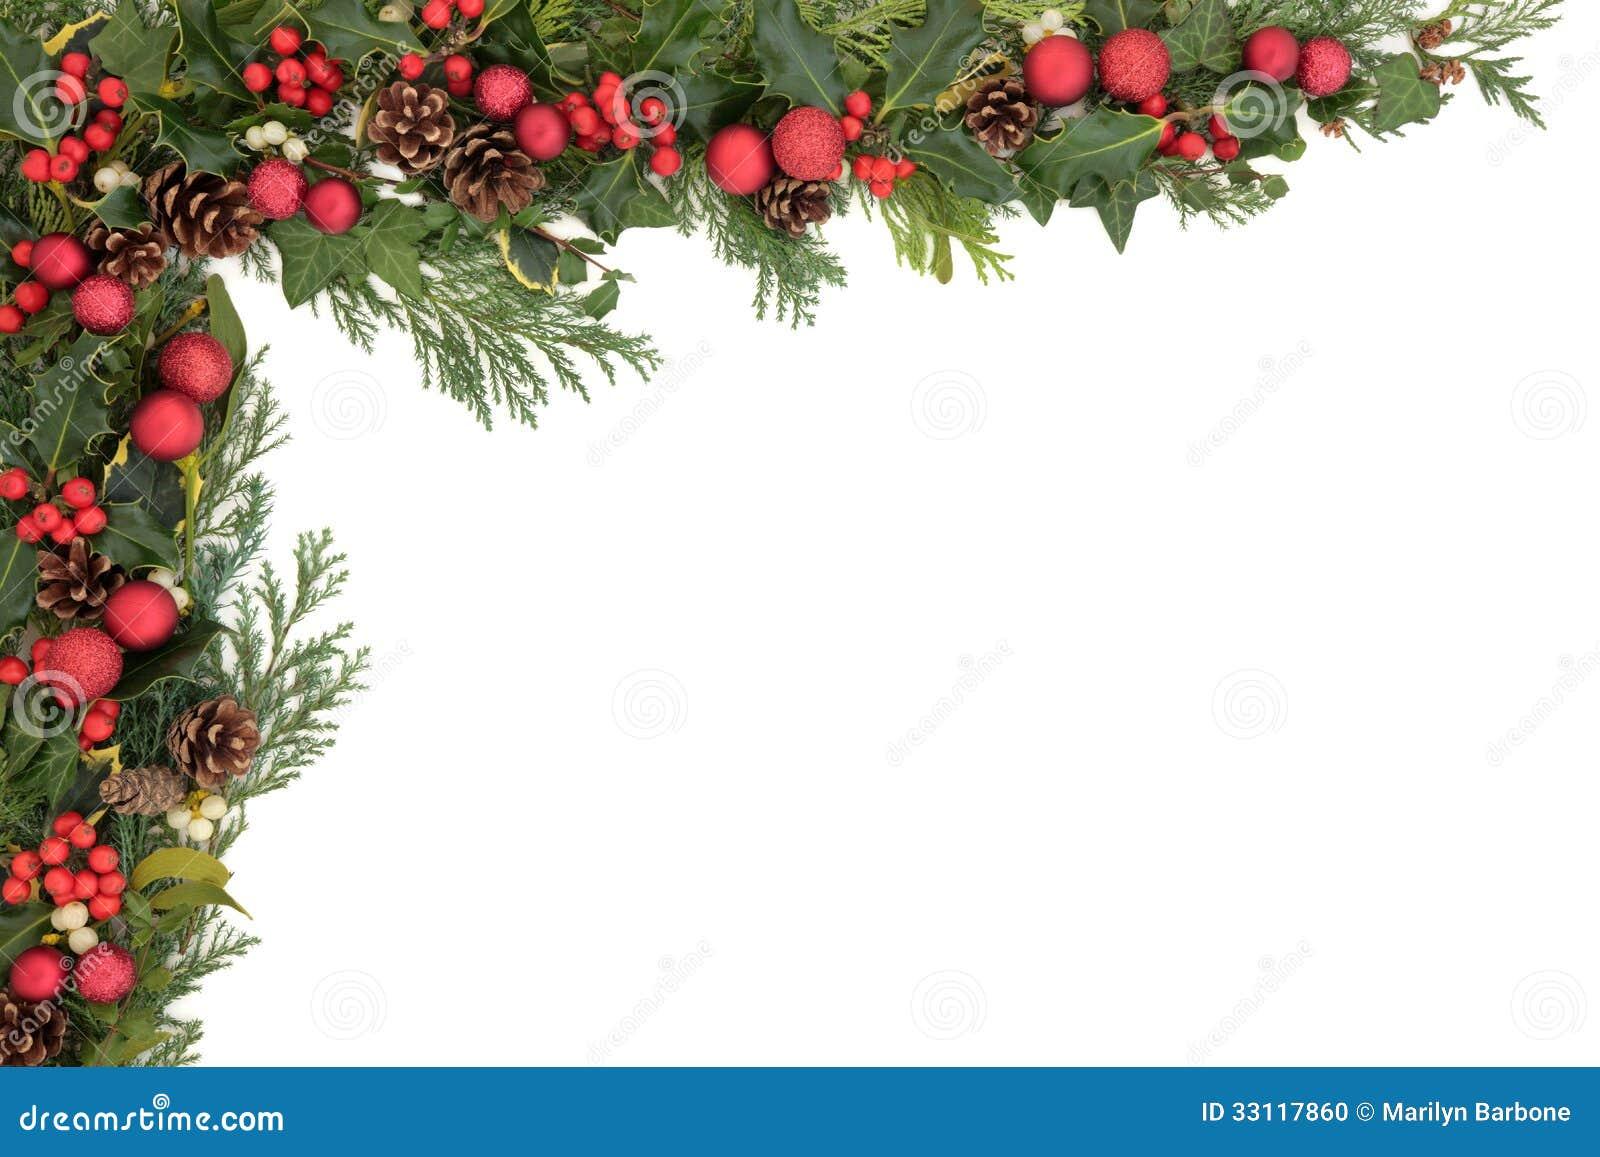 Christmas Holly Border Free Clip Art Christmas border